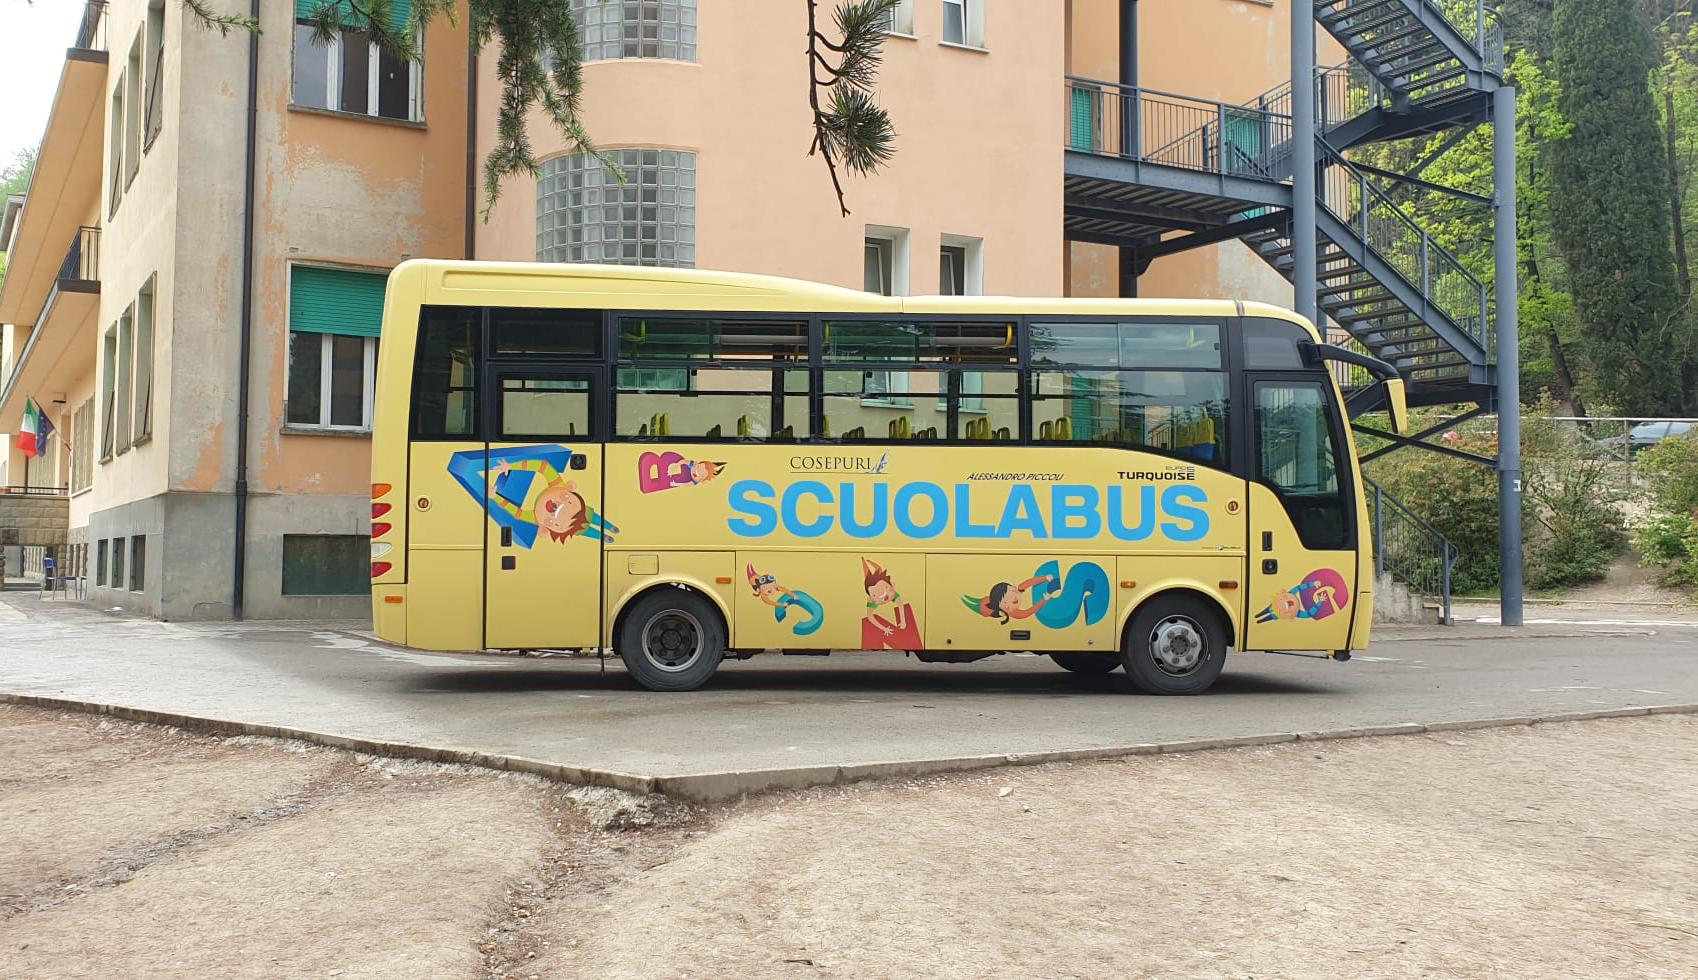 Cosepuri Scholastic Transfer